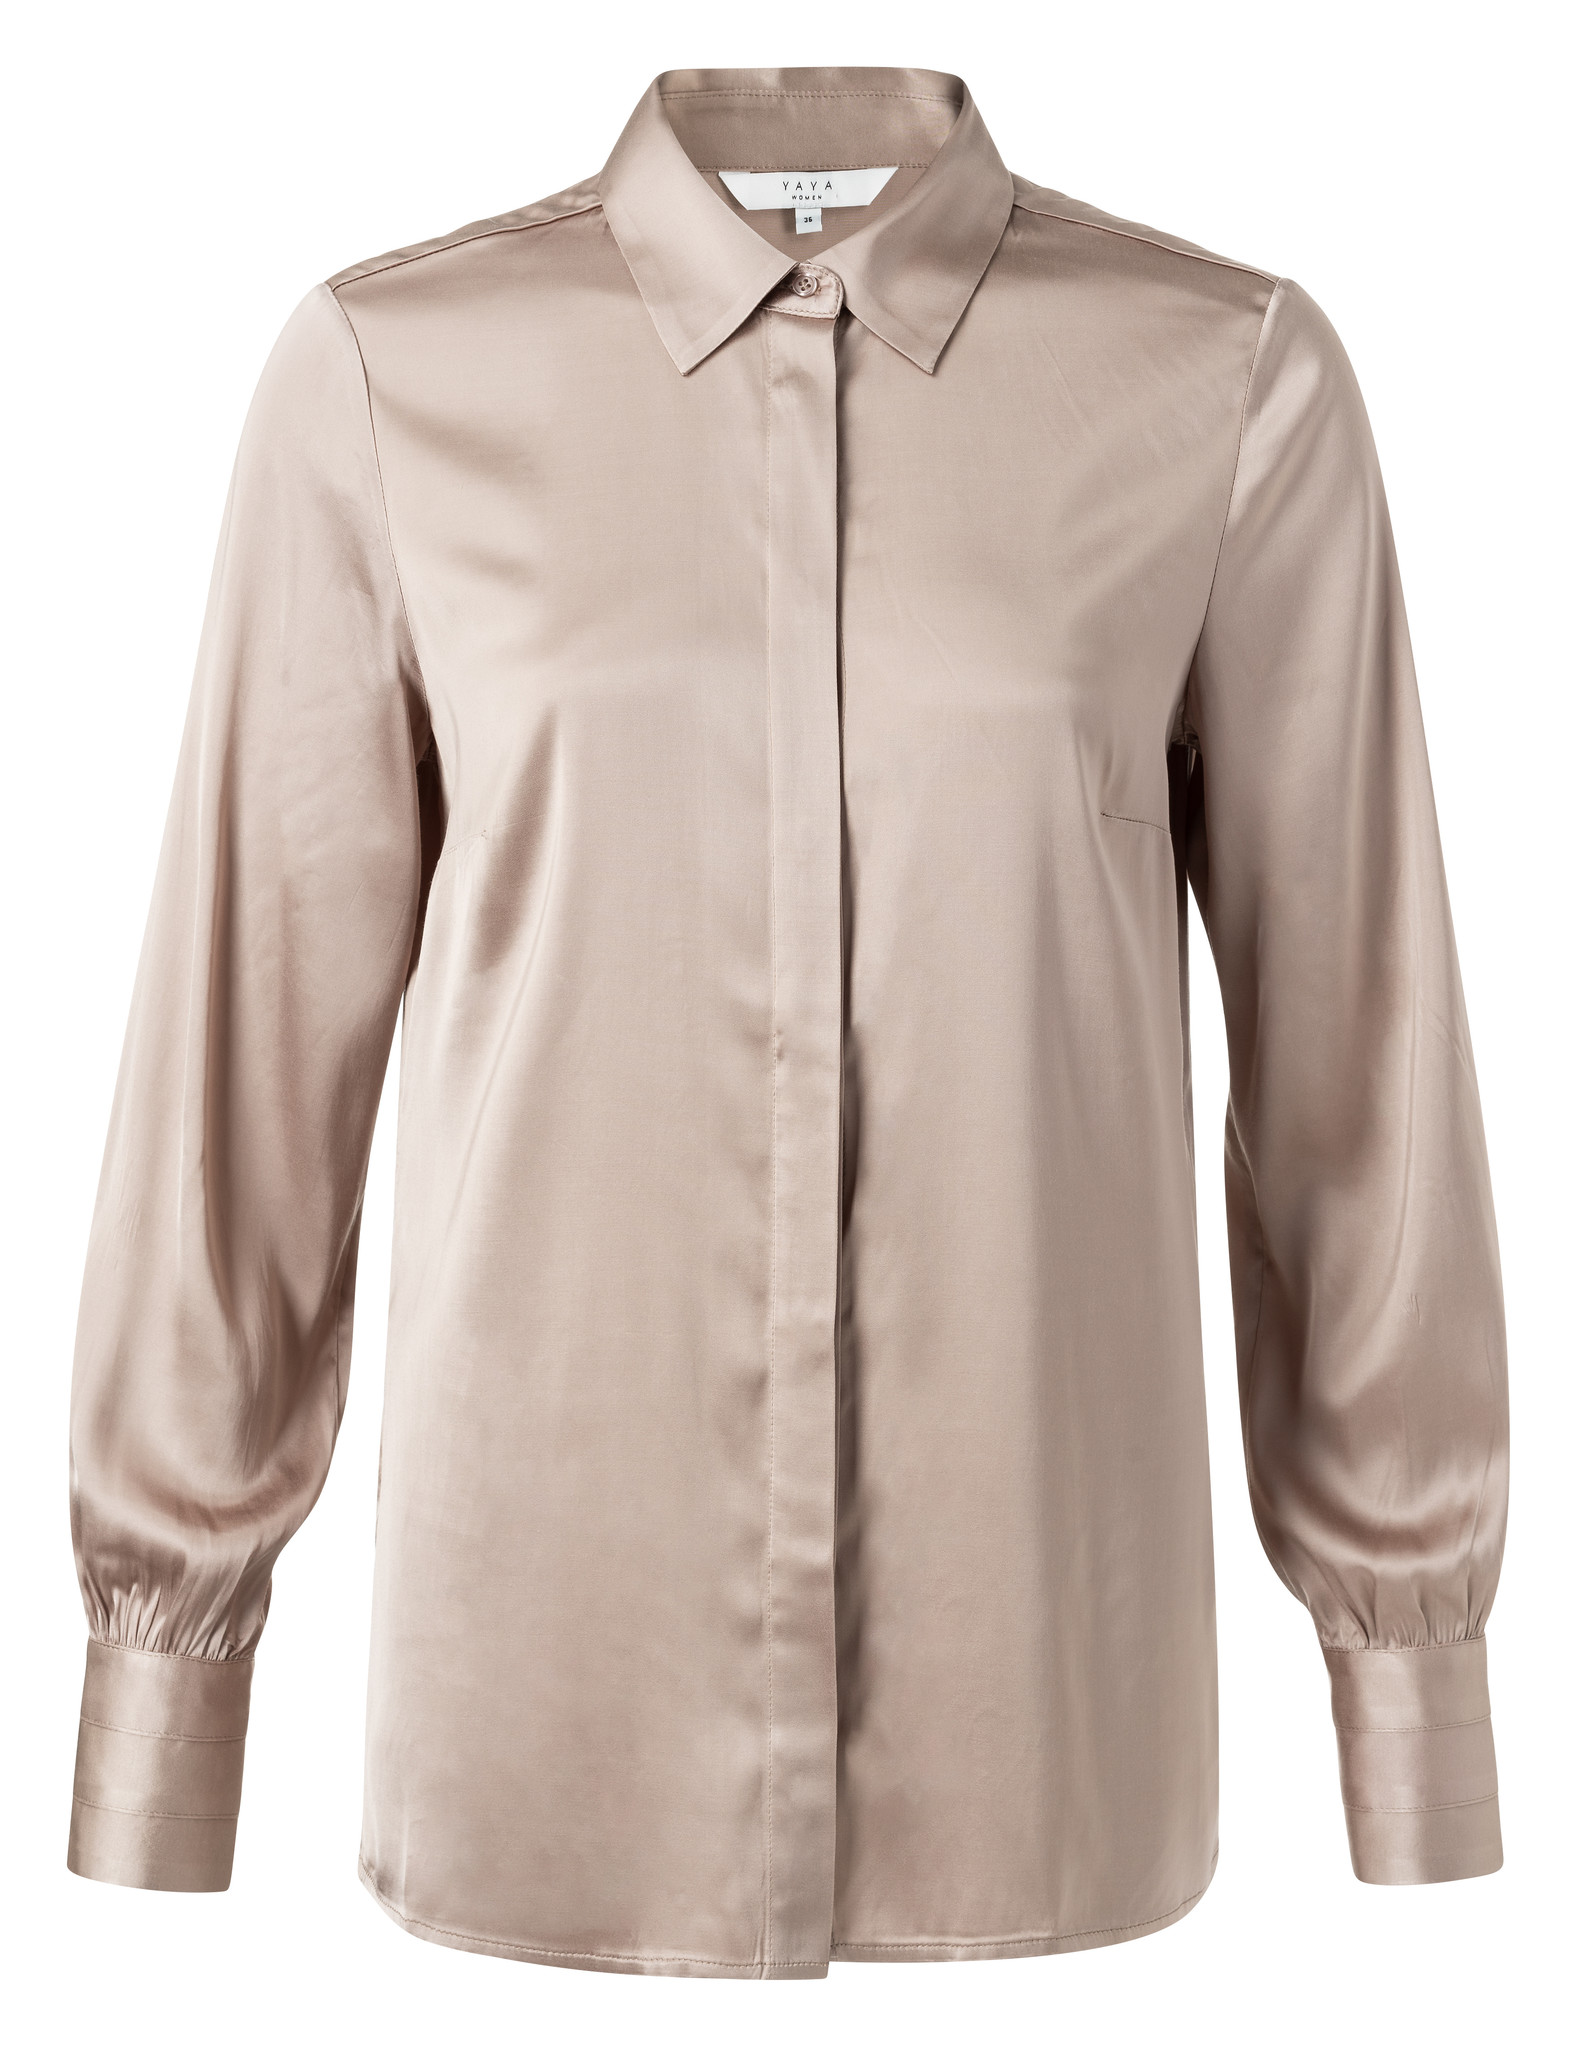 yaya Satin shirt detailed 1101195-111-1